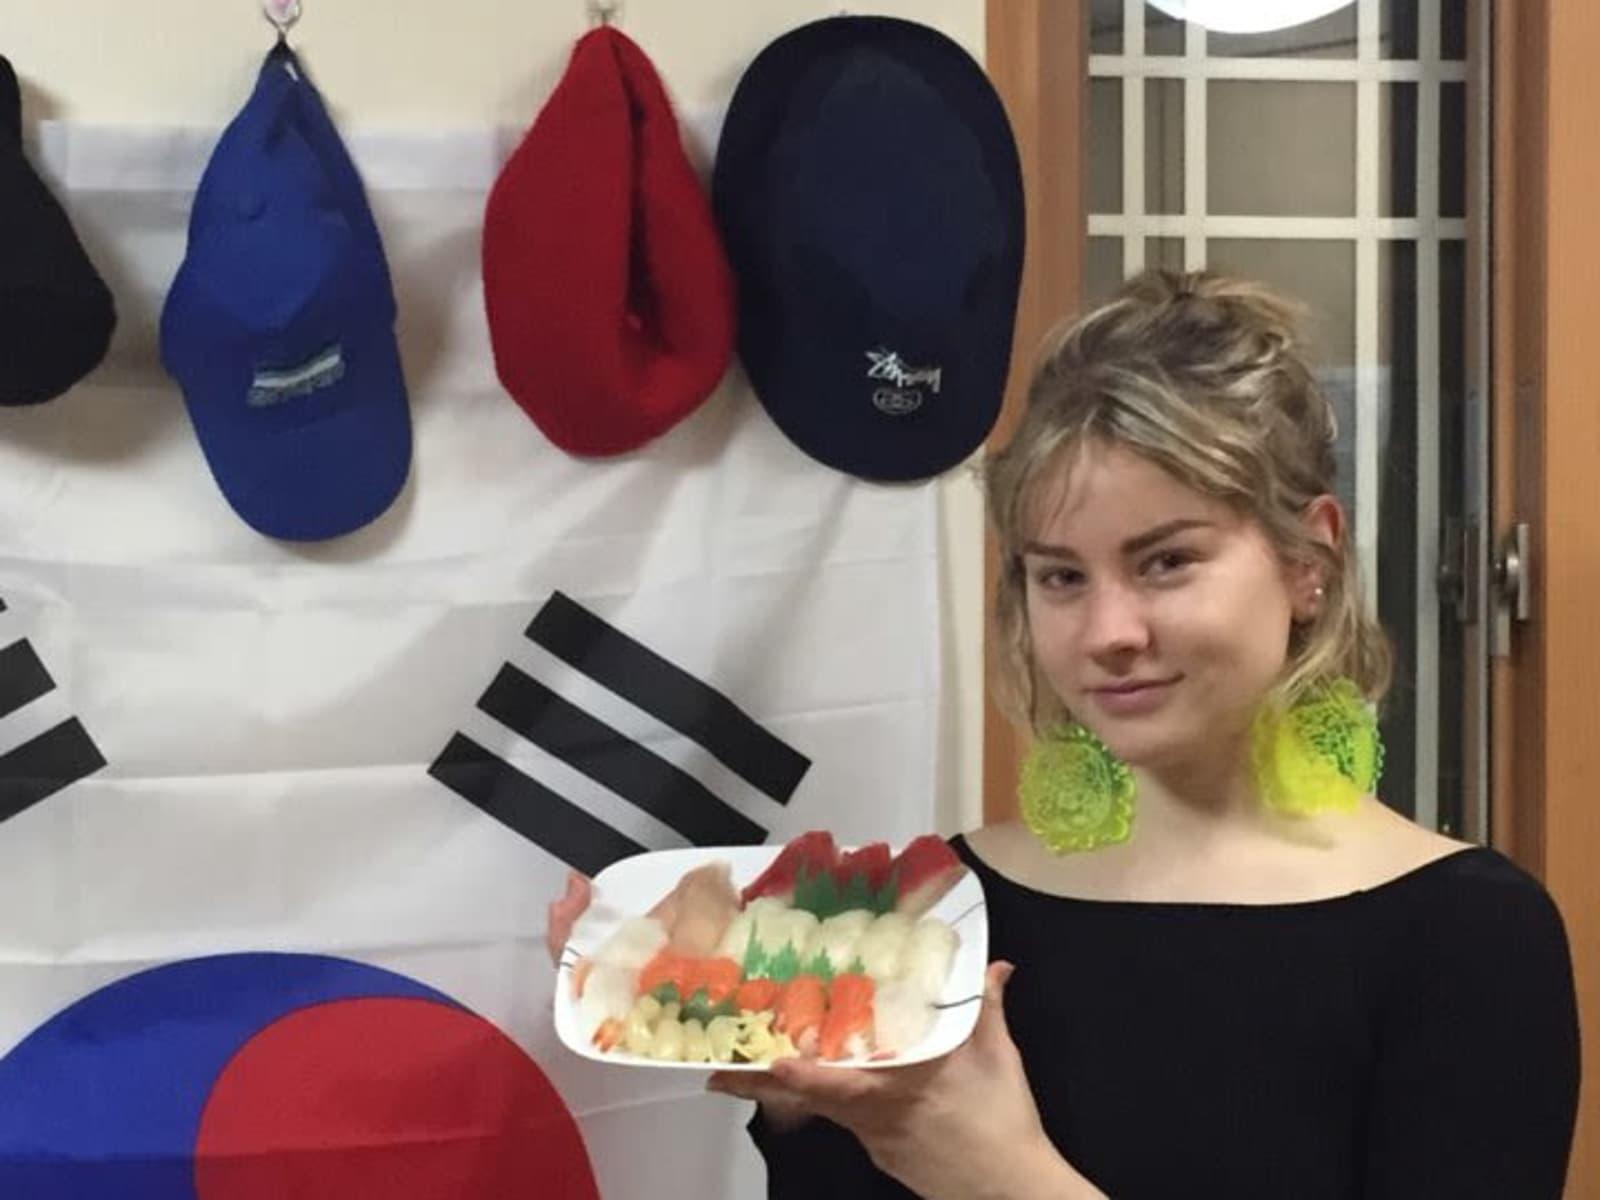 Elizabeth from Yongmeo-ri, South Korea